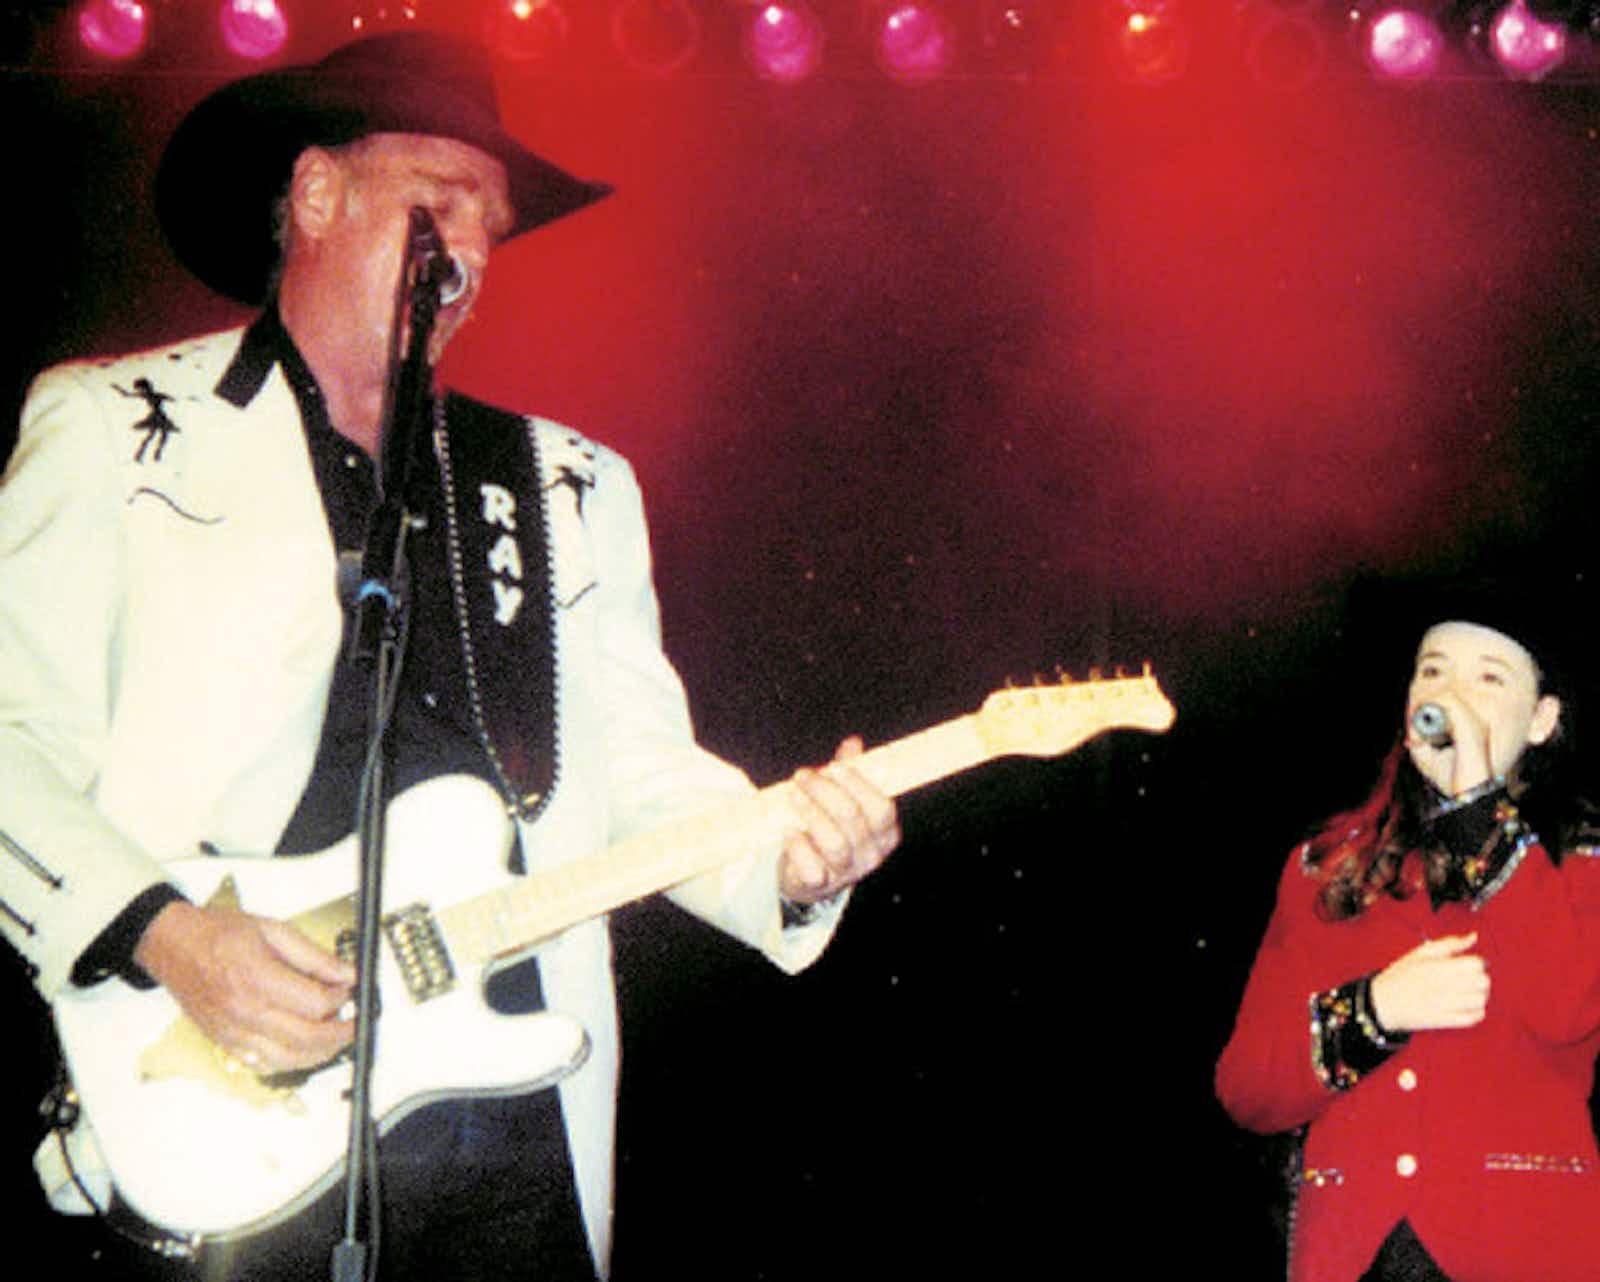 Ray Benson and Kacey Musgraves